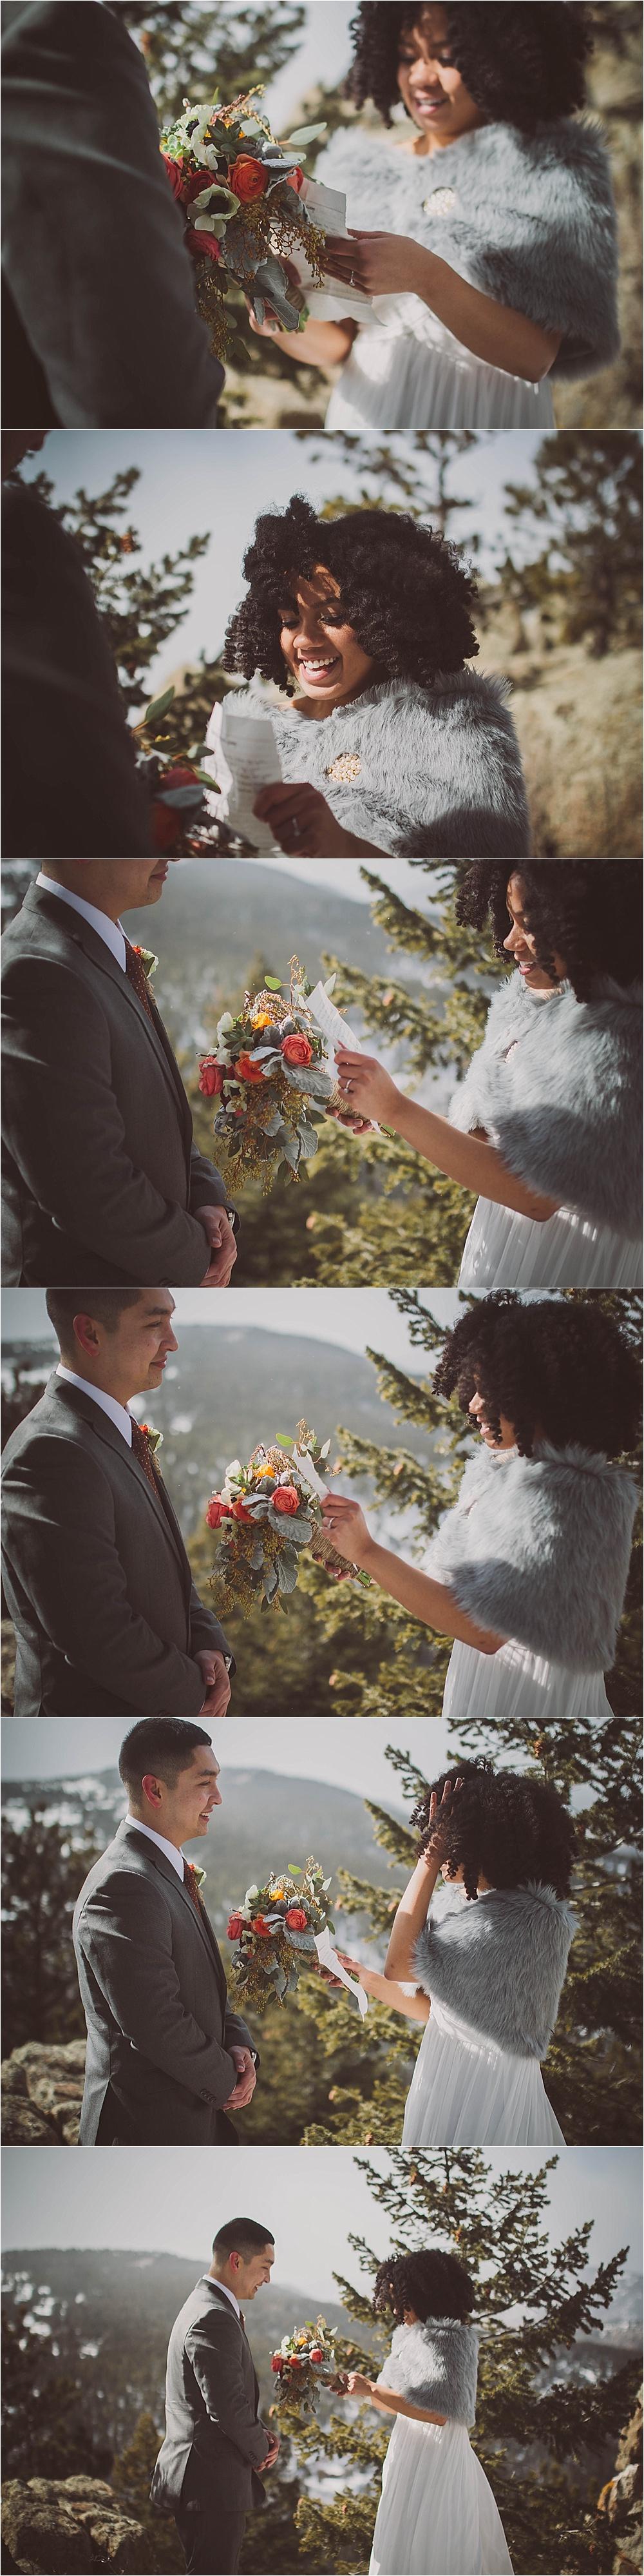 manzanita photo by rebecca caridad wedding lifestlye photography floral design calligraphy_1216.jpg